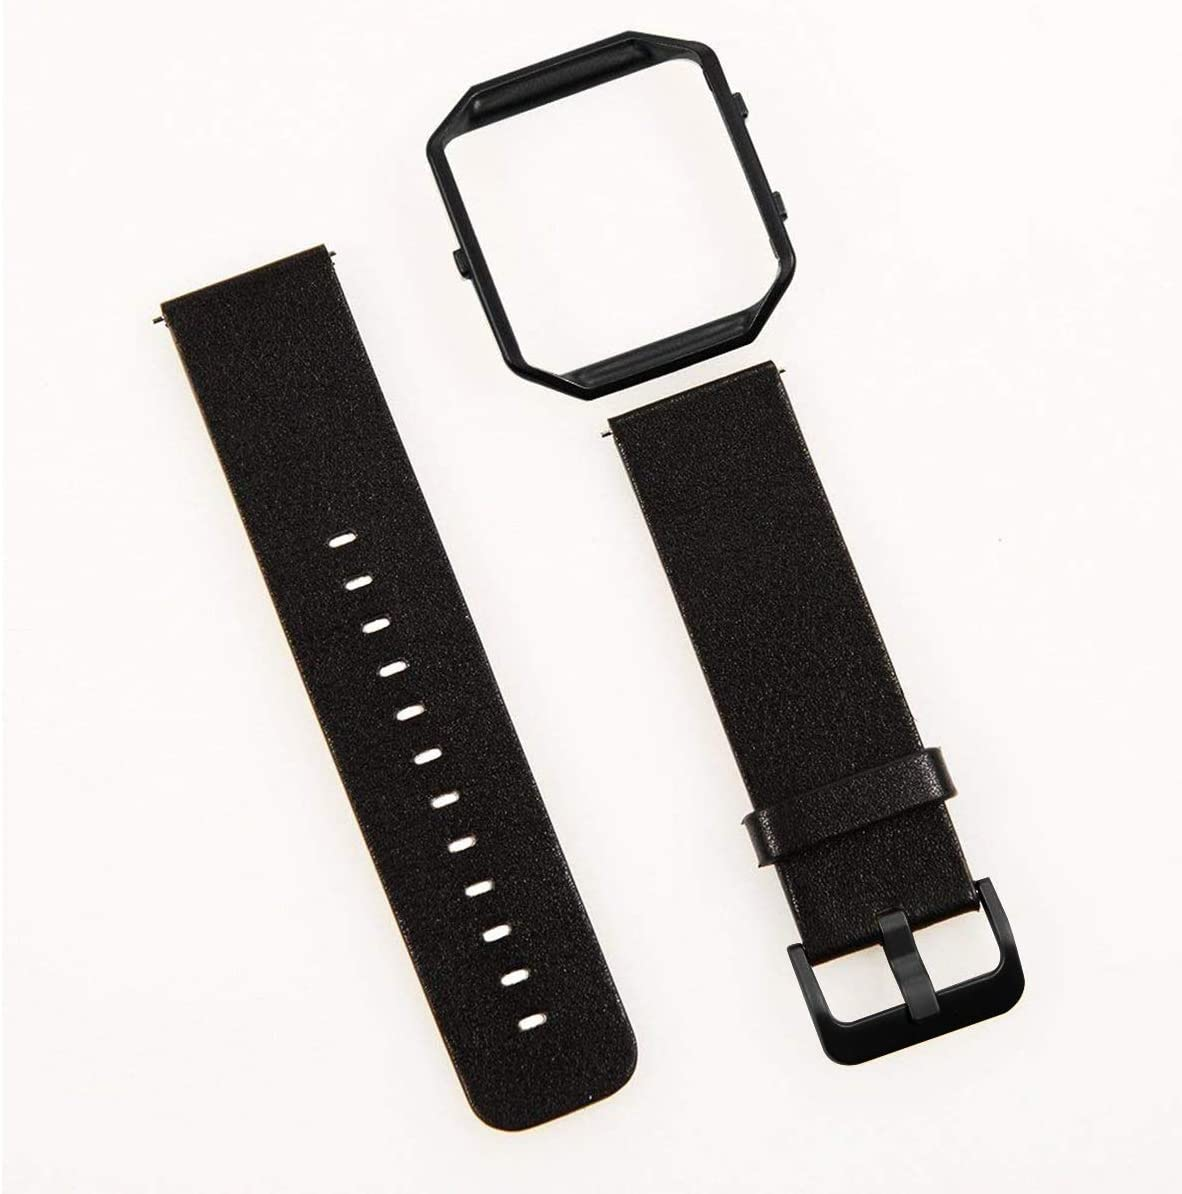 Color : White Leather with Rose Gold, Size : S Topsale-ycld Echtes Leder Uhr Ersatzband Armband Stahlrahmen F/ür Fitbit Blaze Armband